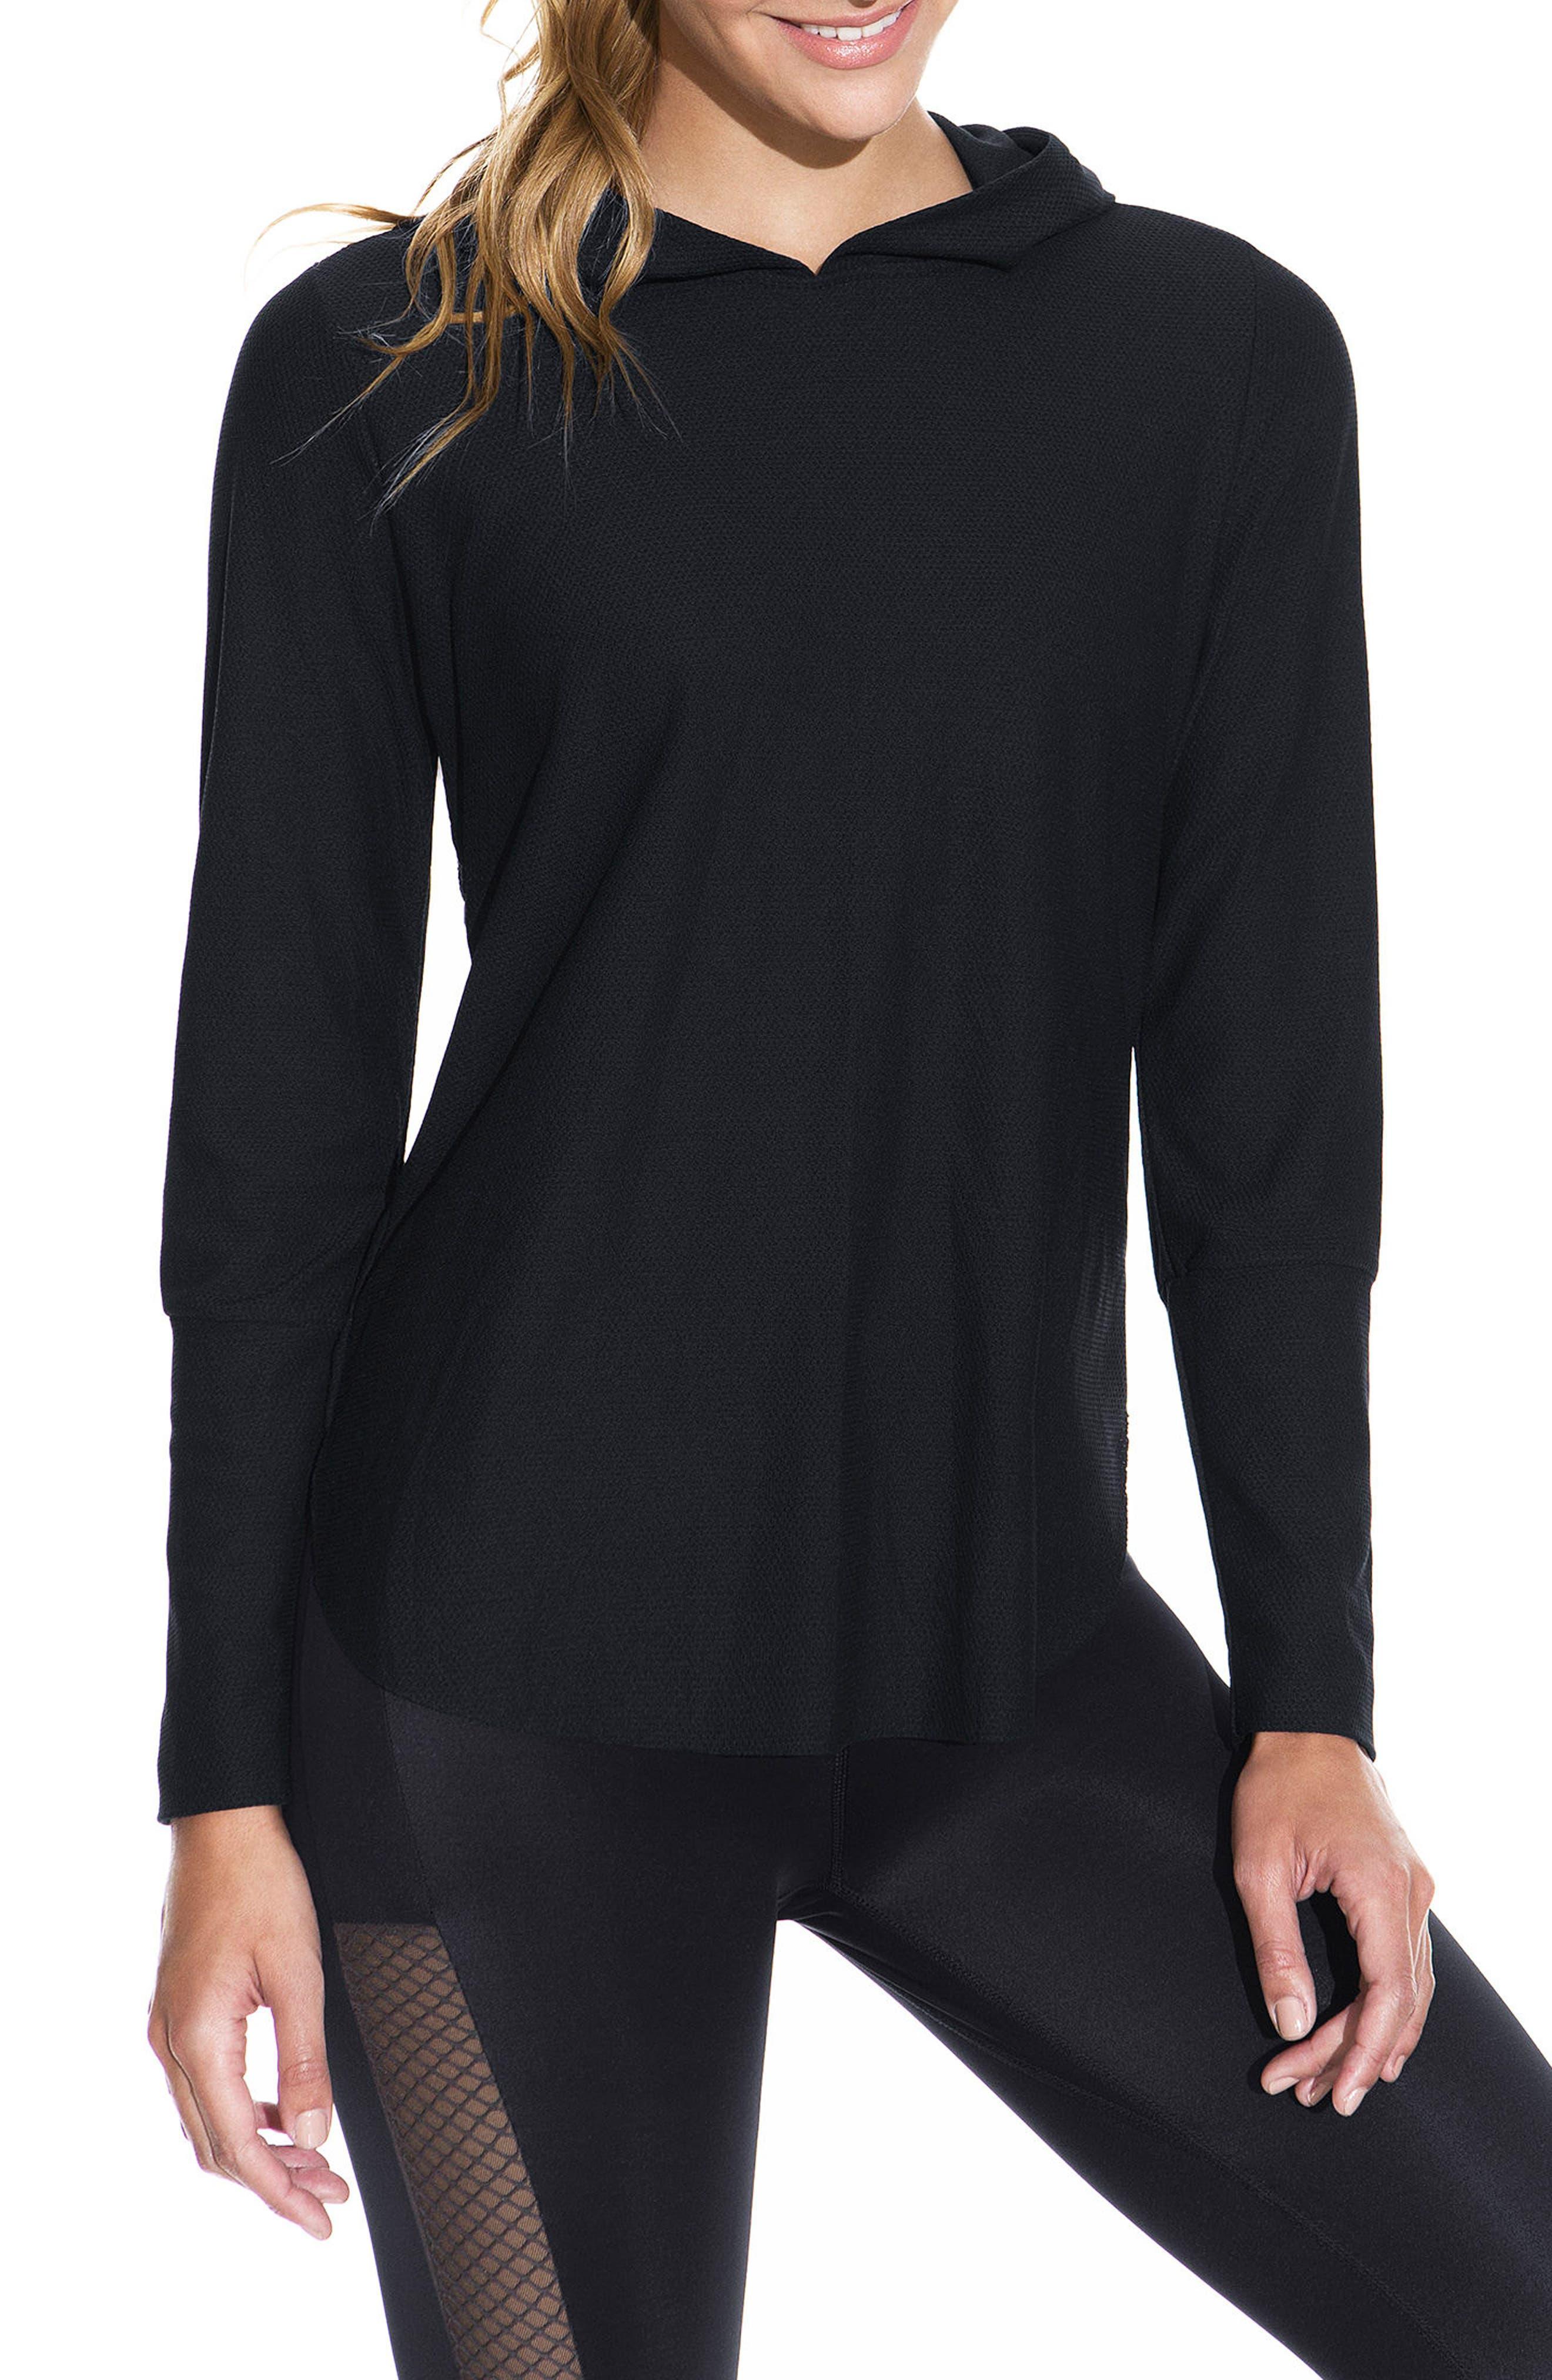 Sheer Waves Onyx Long Sleeve Top,                         Main,                         color, BLACK